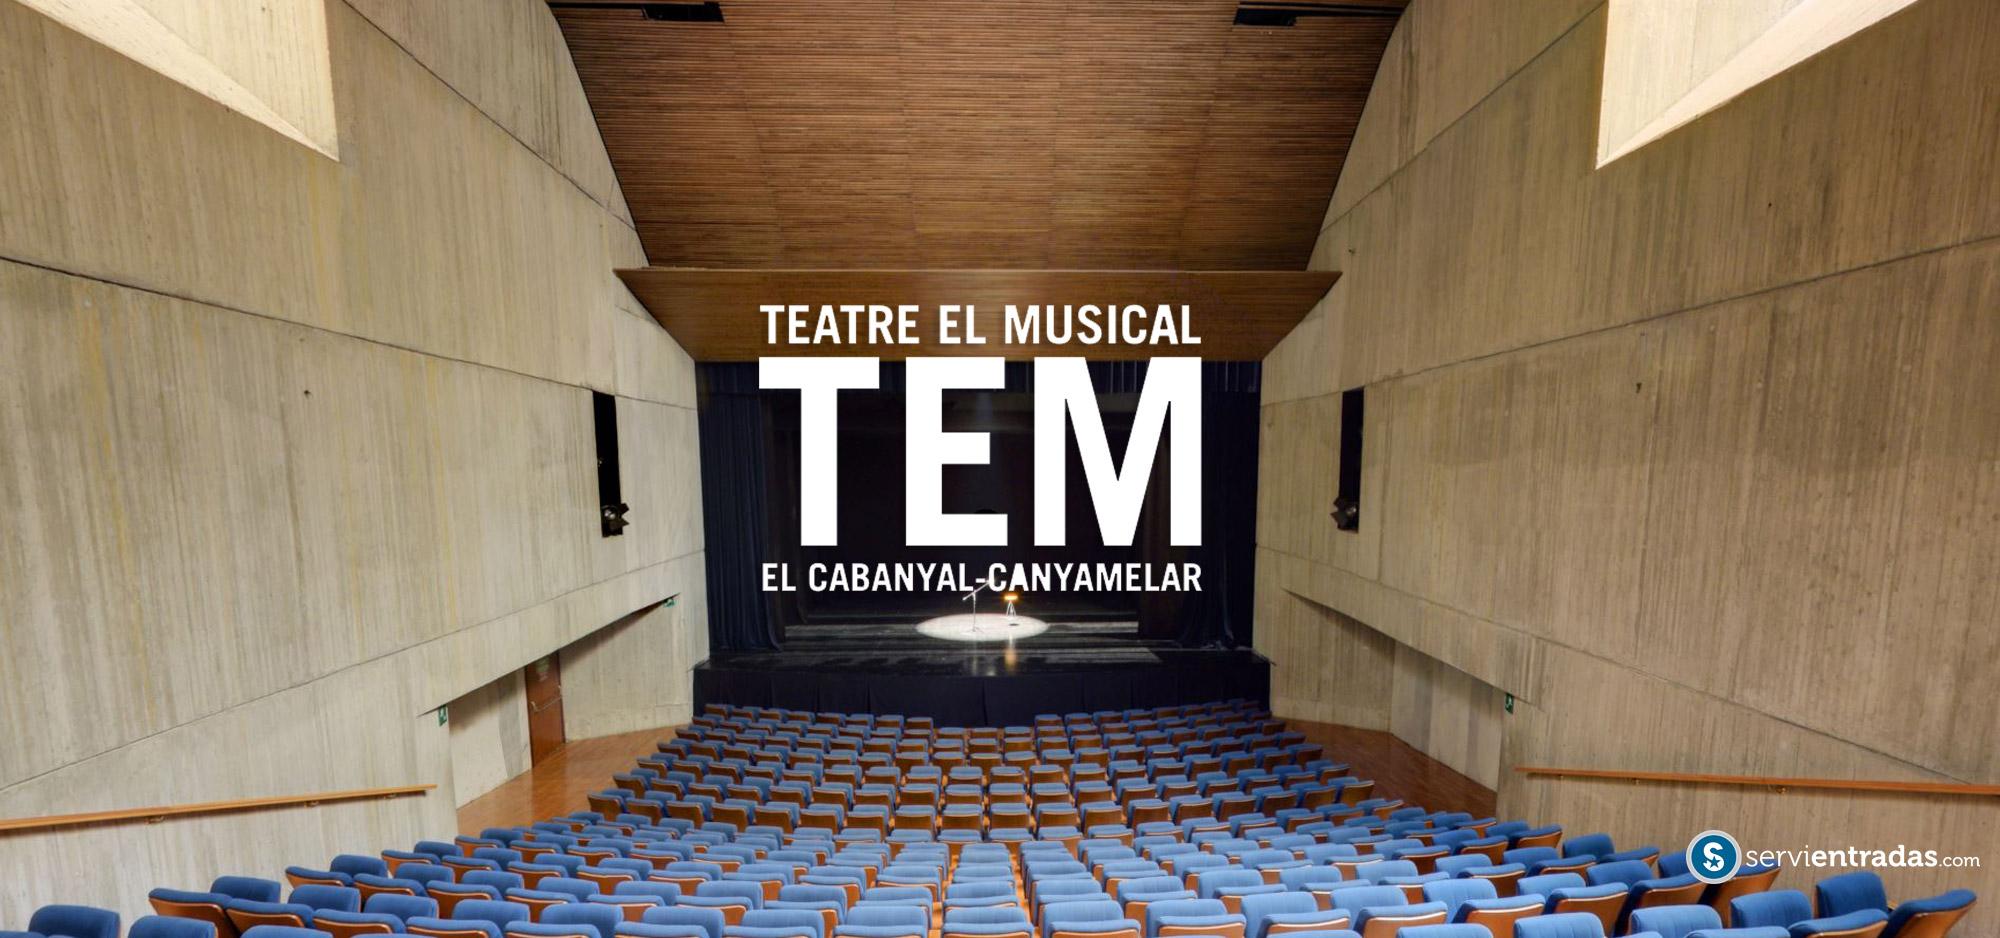 TEATRO EL MÚSICAL (TEM)